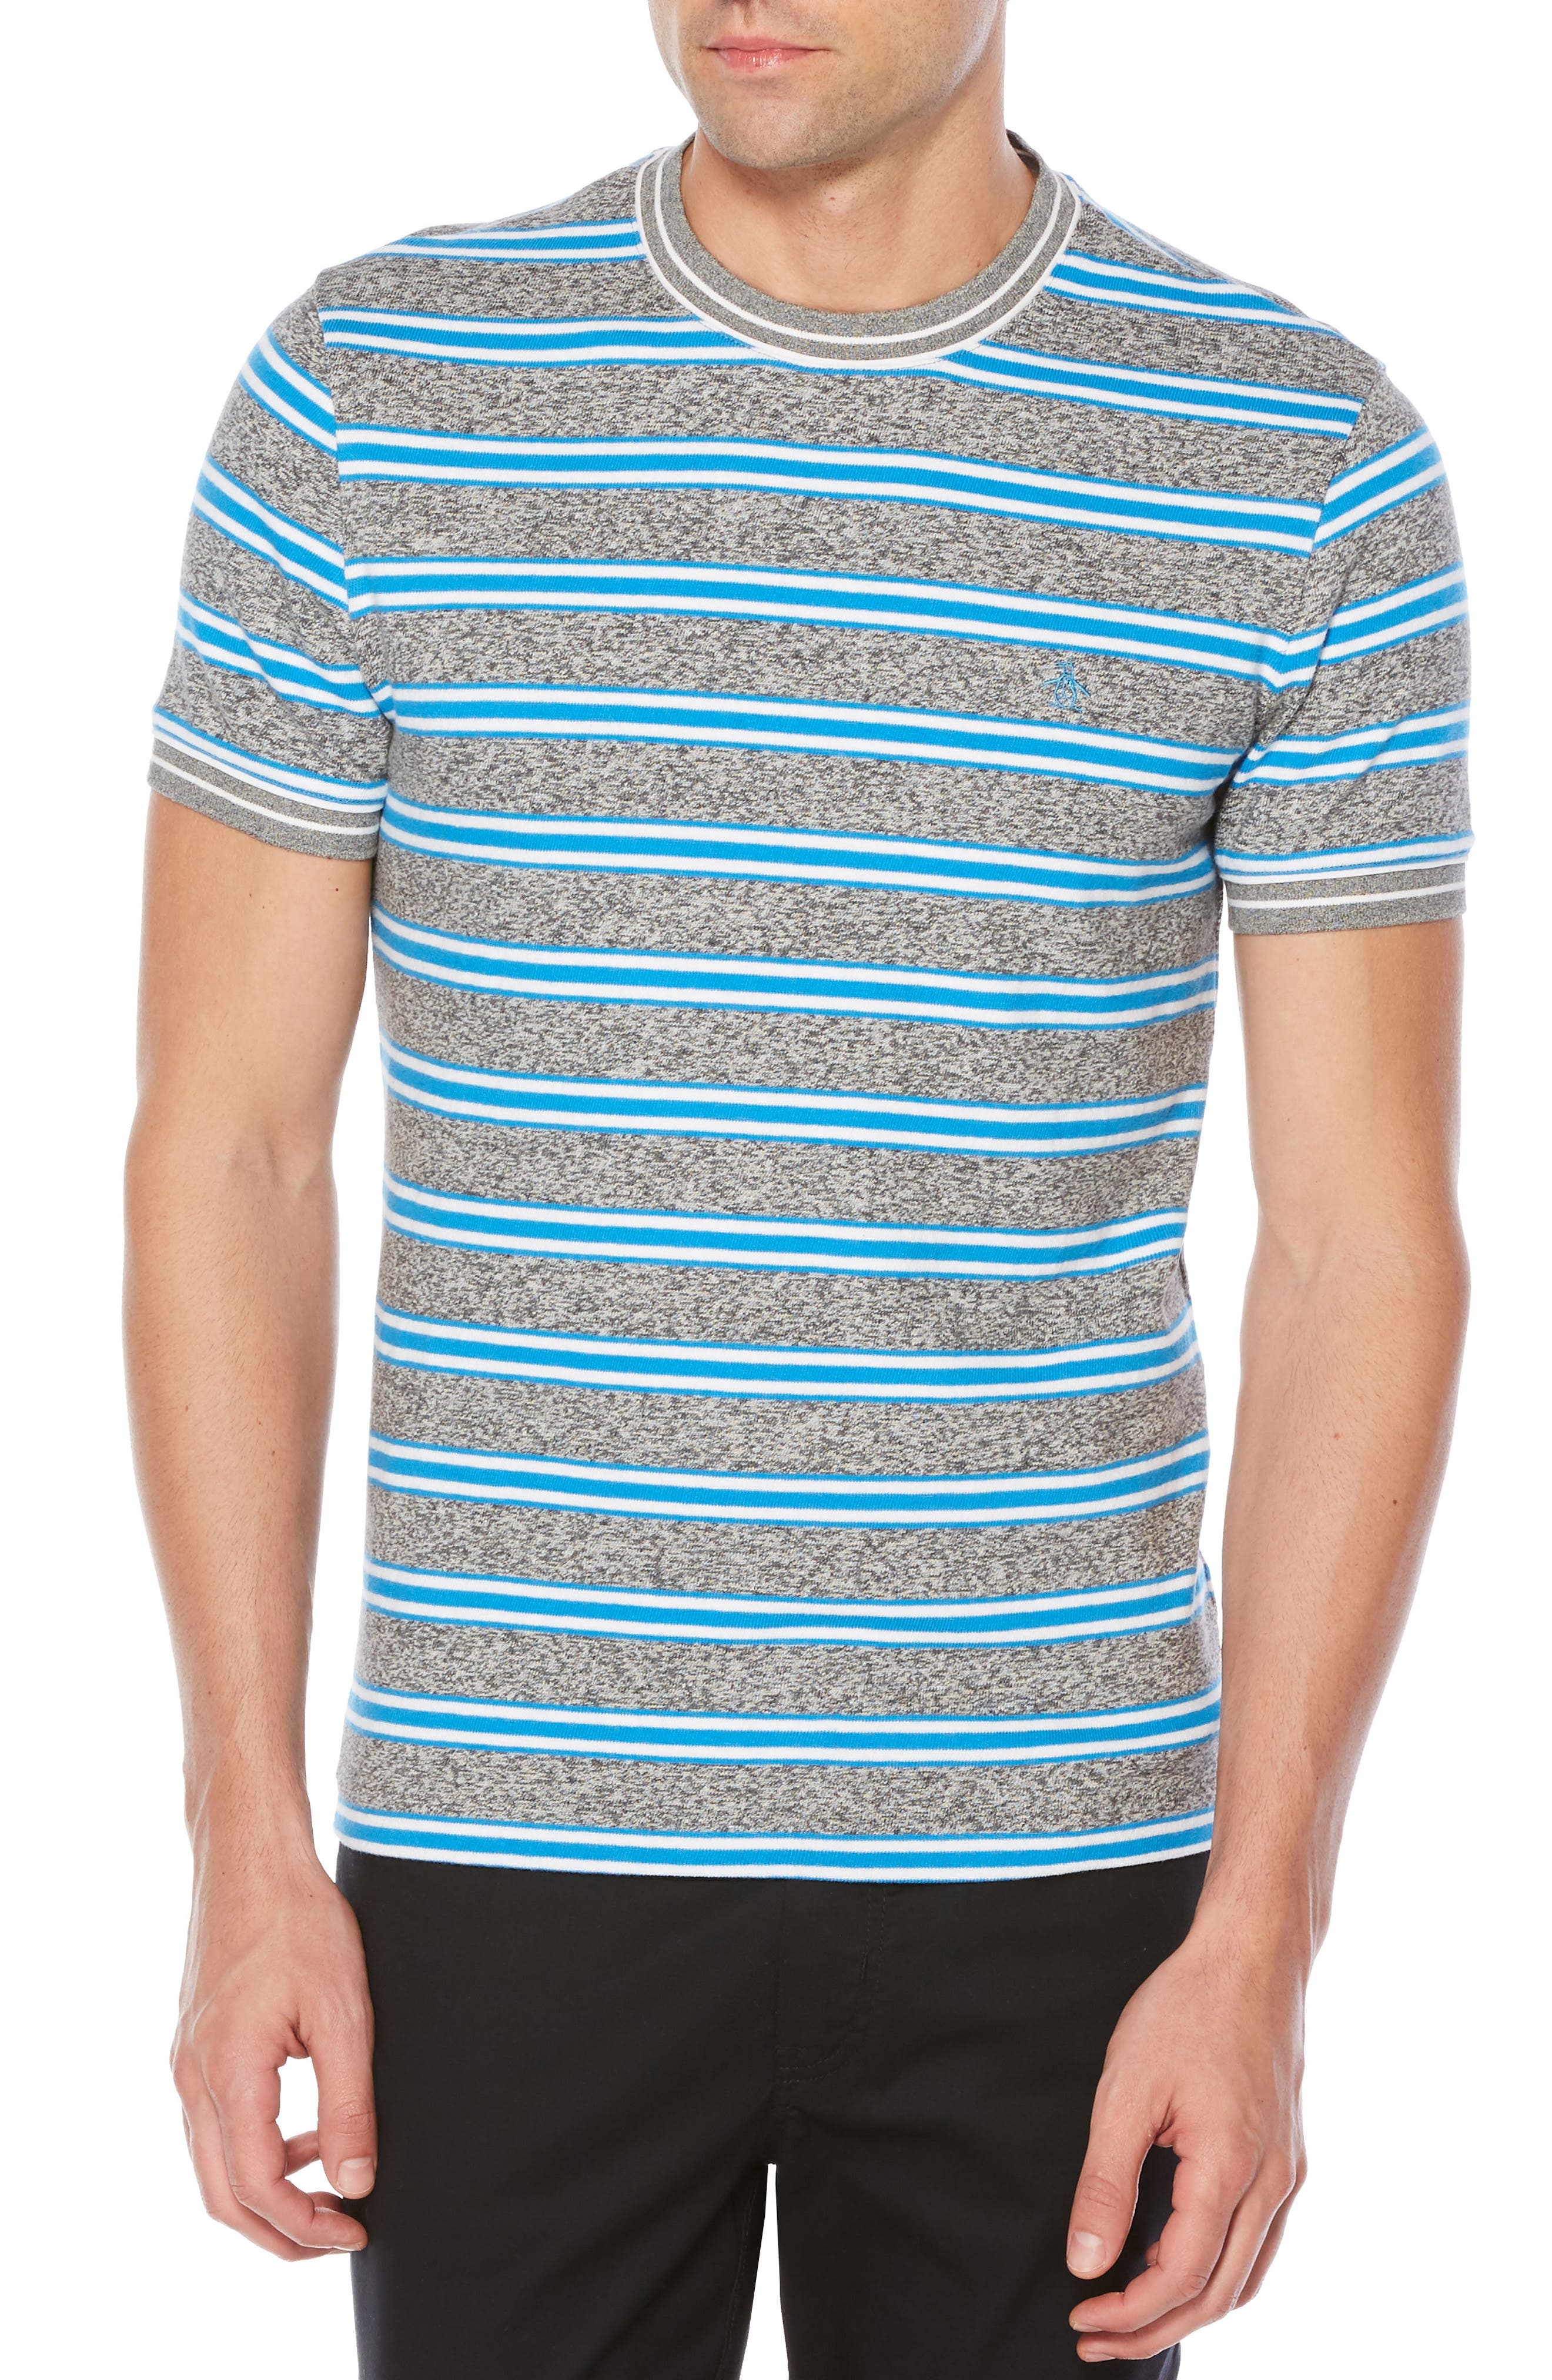 Main Image - Original Penguin Jaspé Retro Stripe T-Shirt